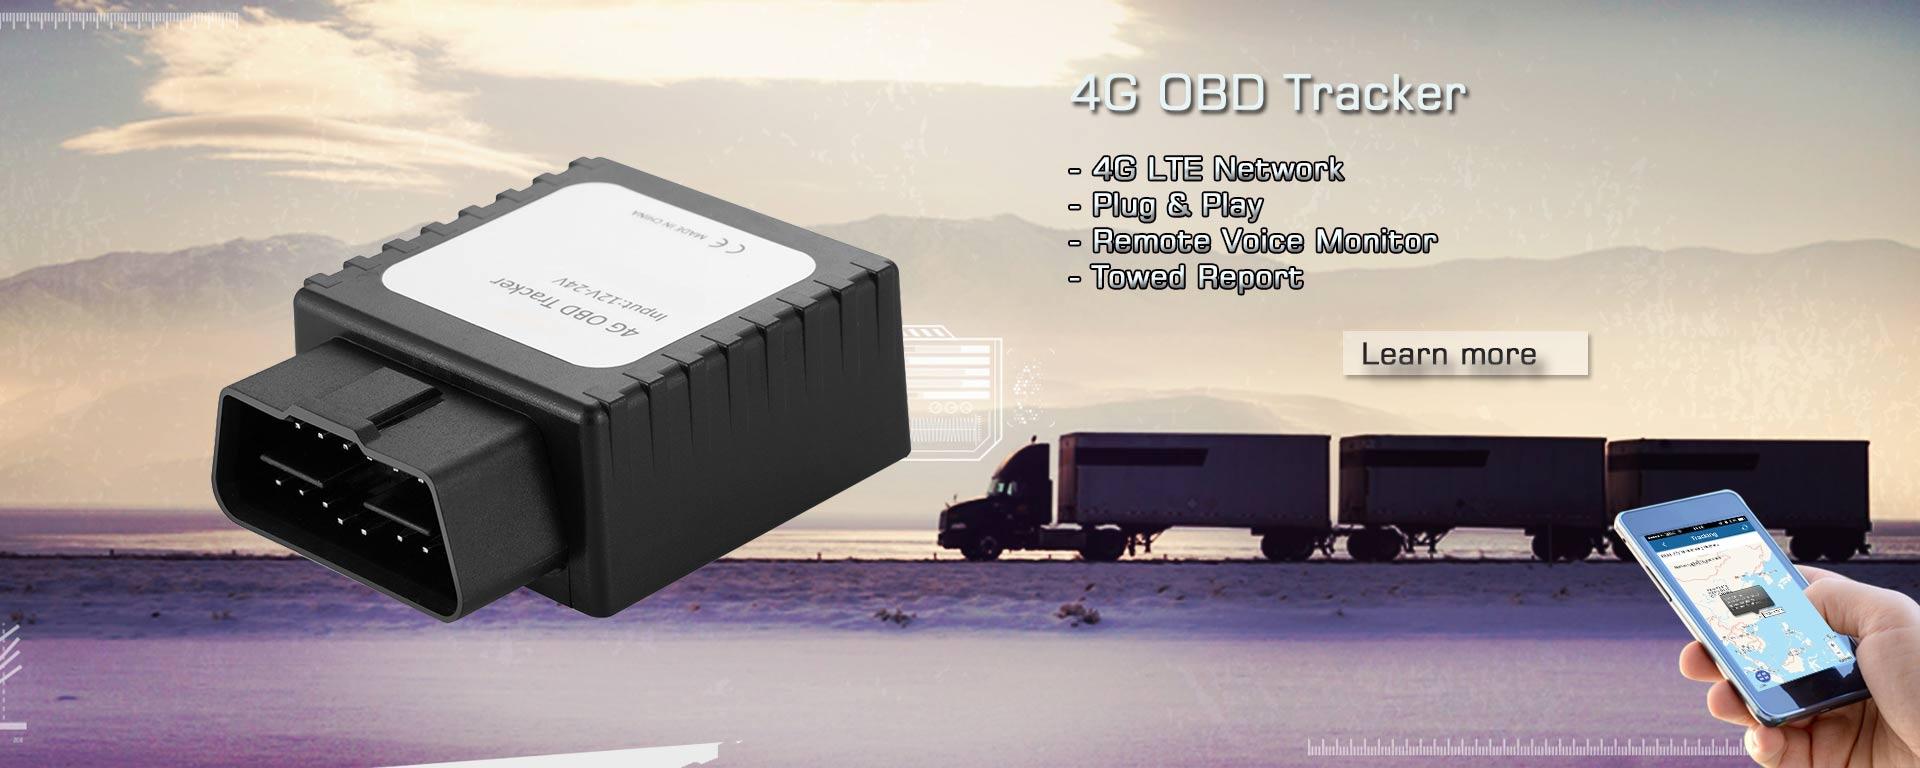 4G OBD GPS tracker